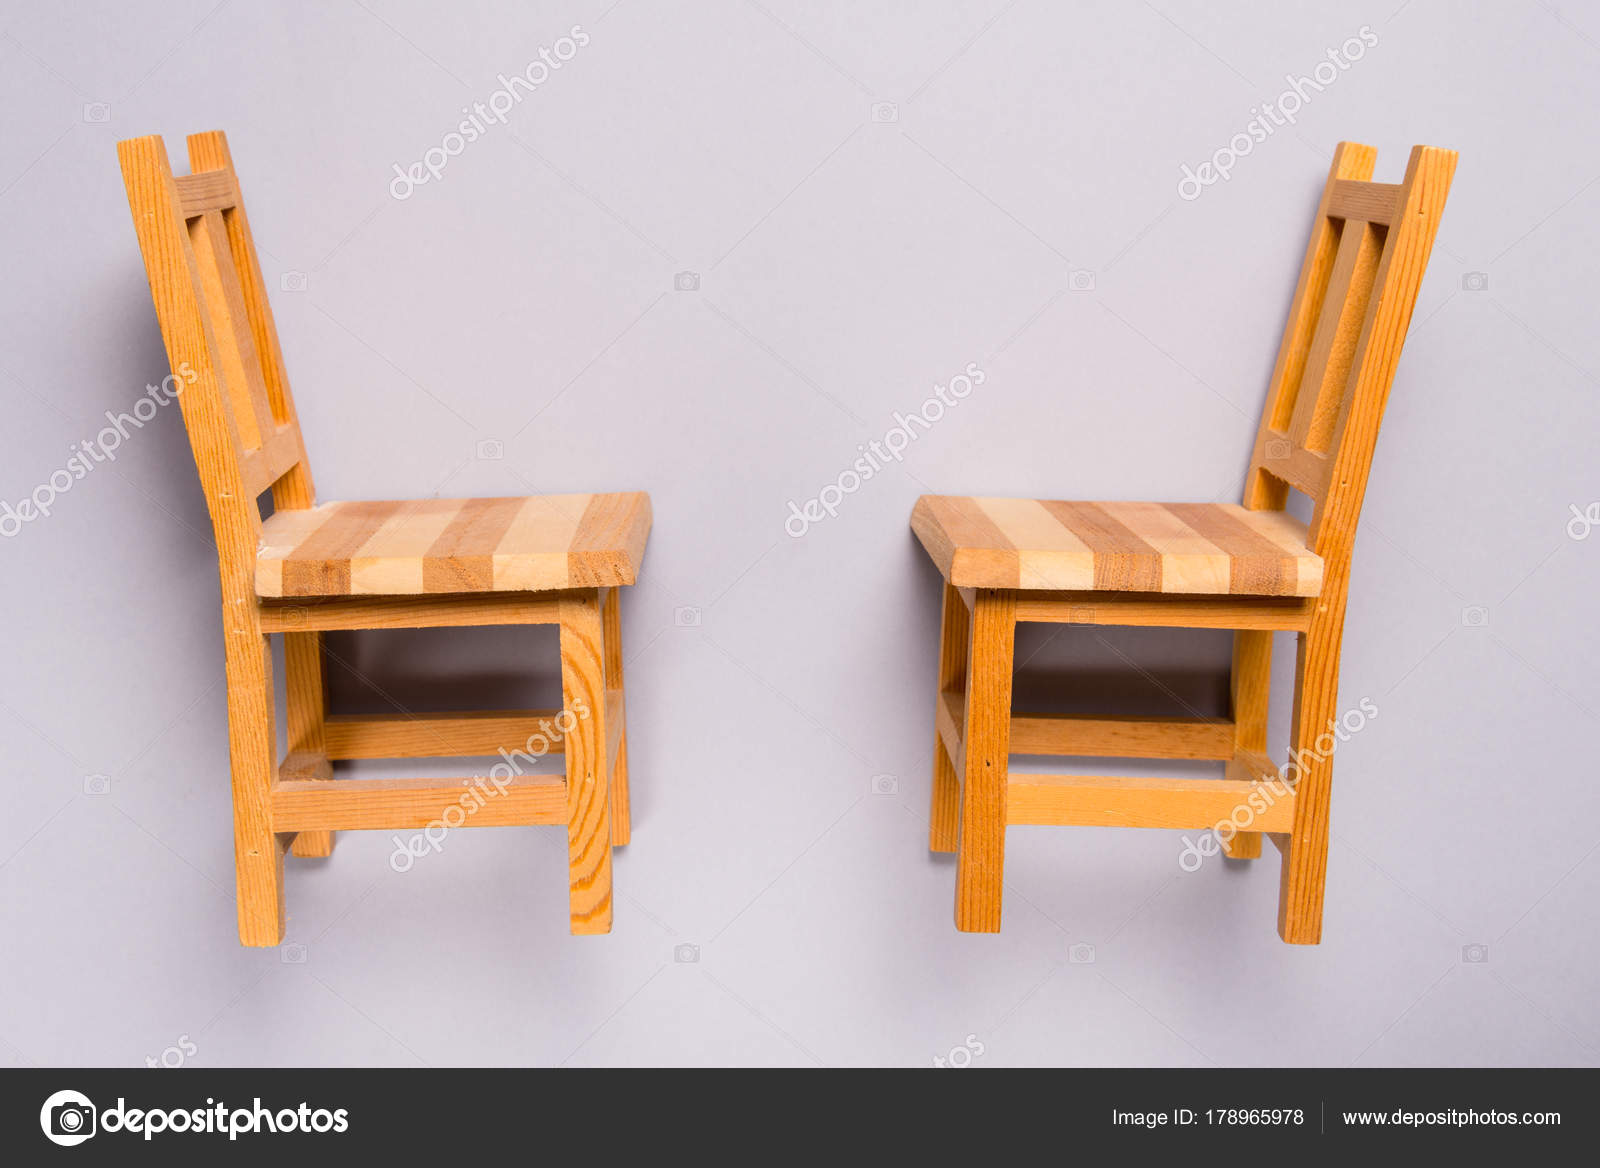 Miniatuur Design Meubels : Mini meubels van rietveld in atrium den haag ad